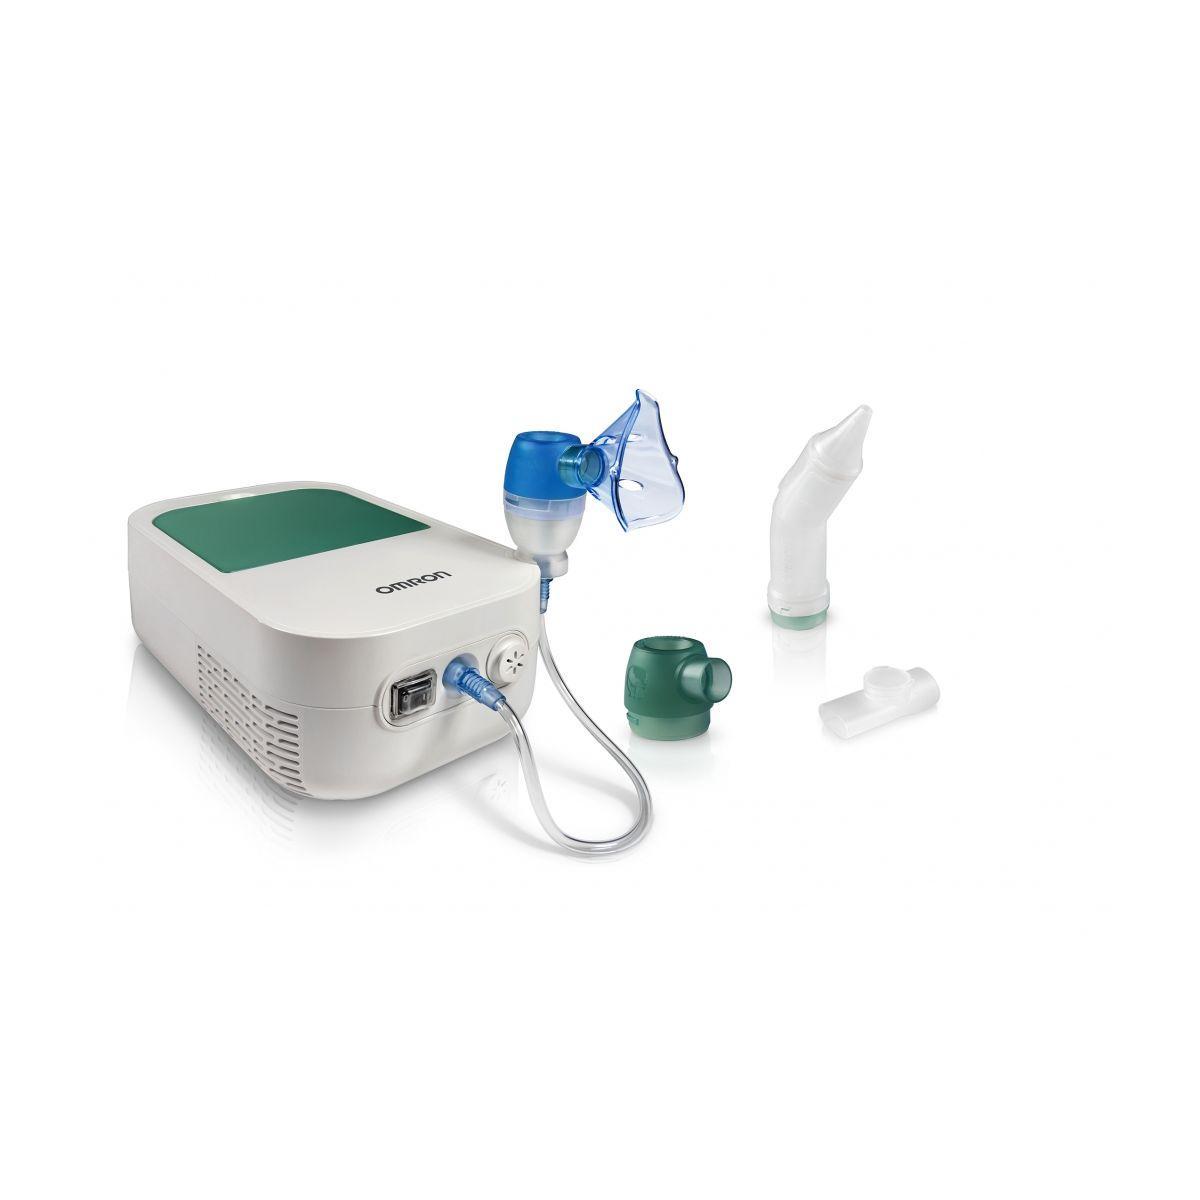 Aspirateur nasal et n�buliseur pour b�b� omron duo baby aspirateur nasal n�buliseur - livraison offerte : code premium (photo)